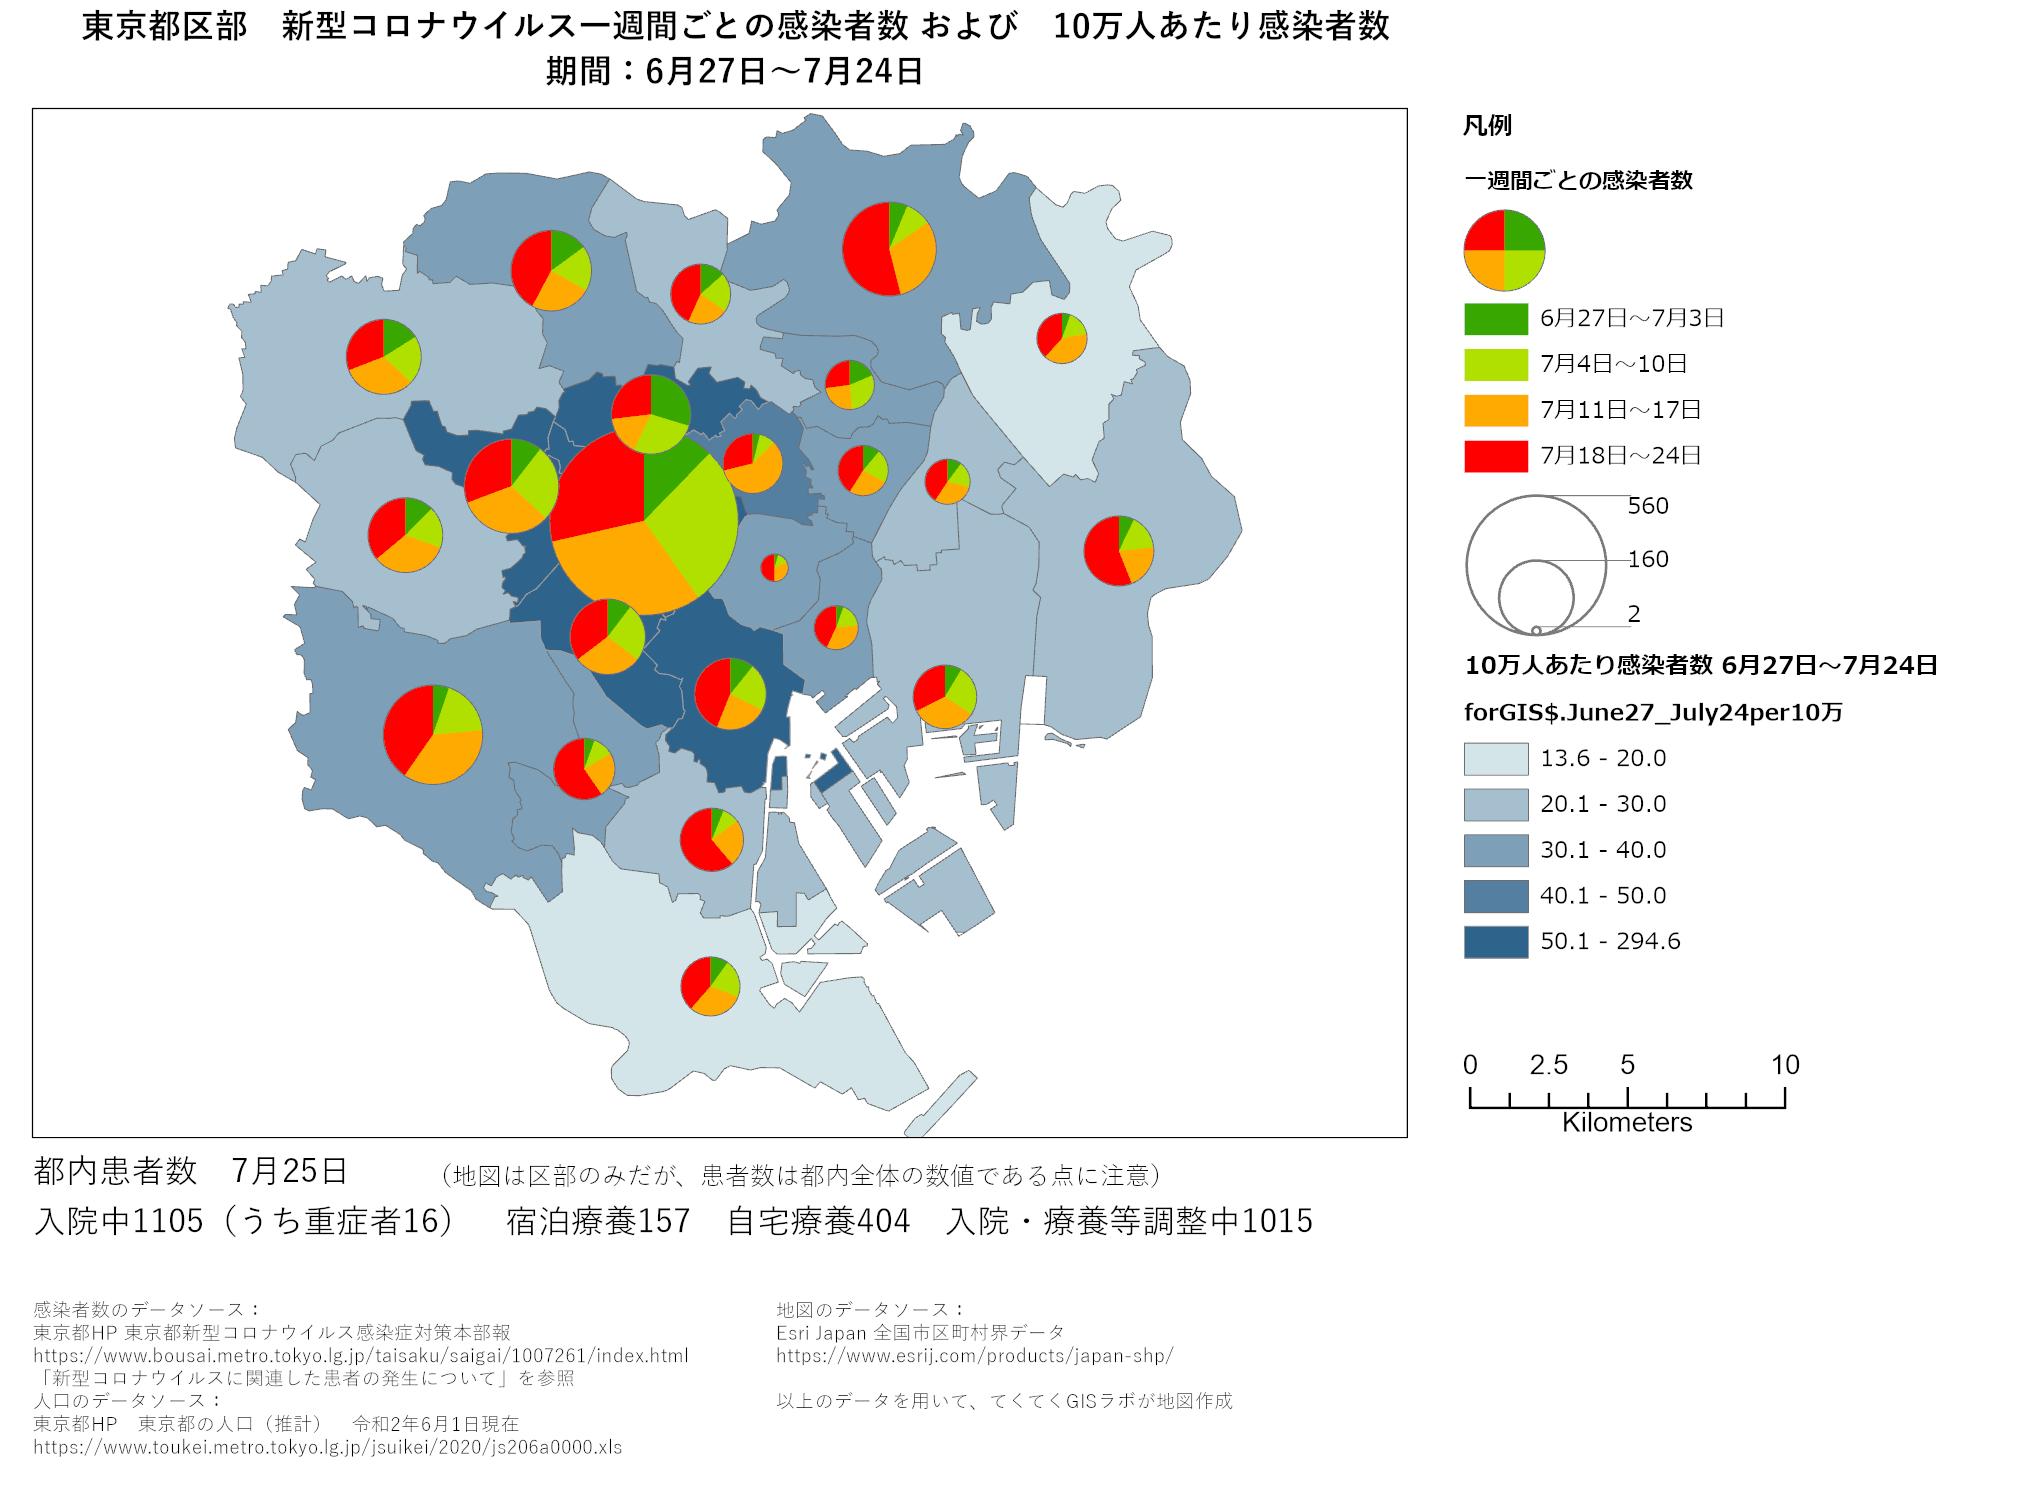 1週間ごと感染者数、東京都、6月27日〜7月24日